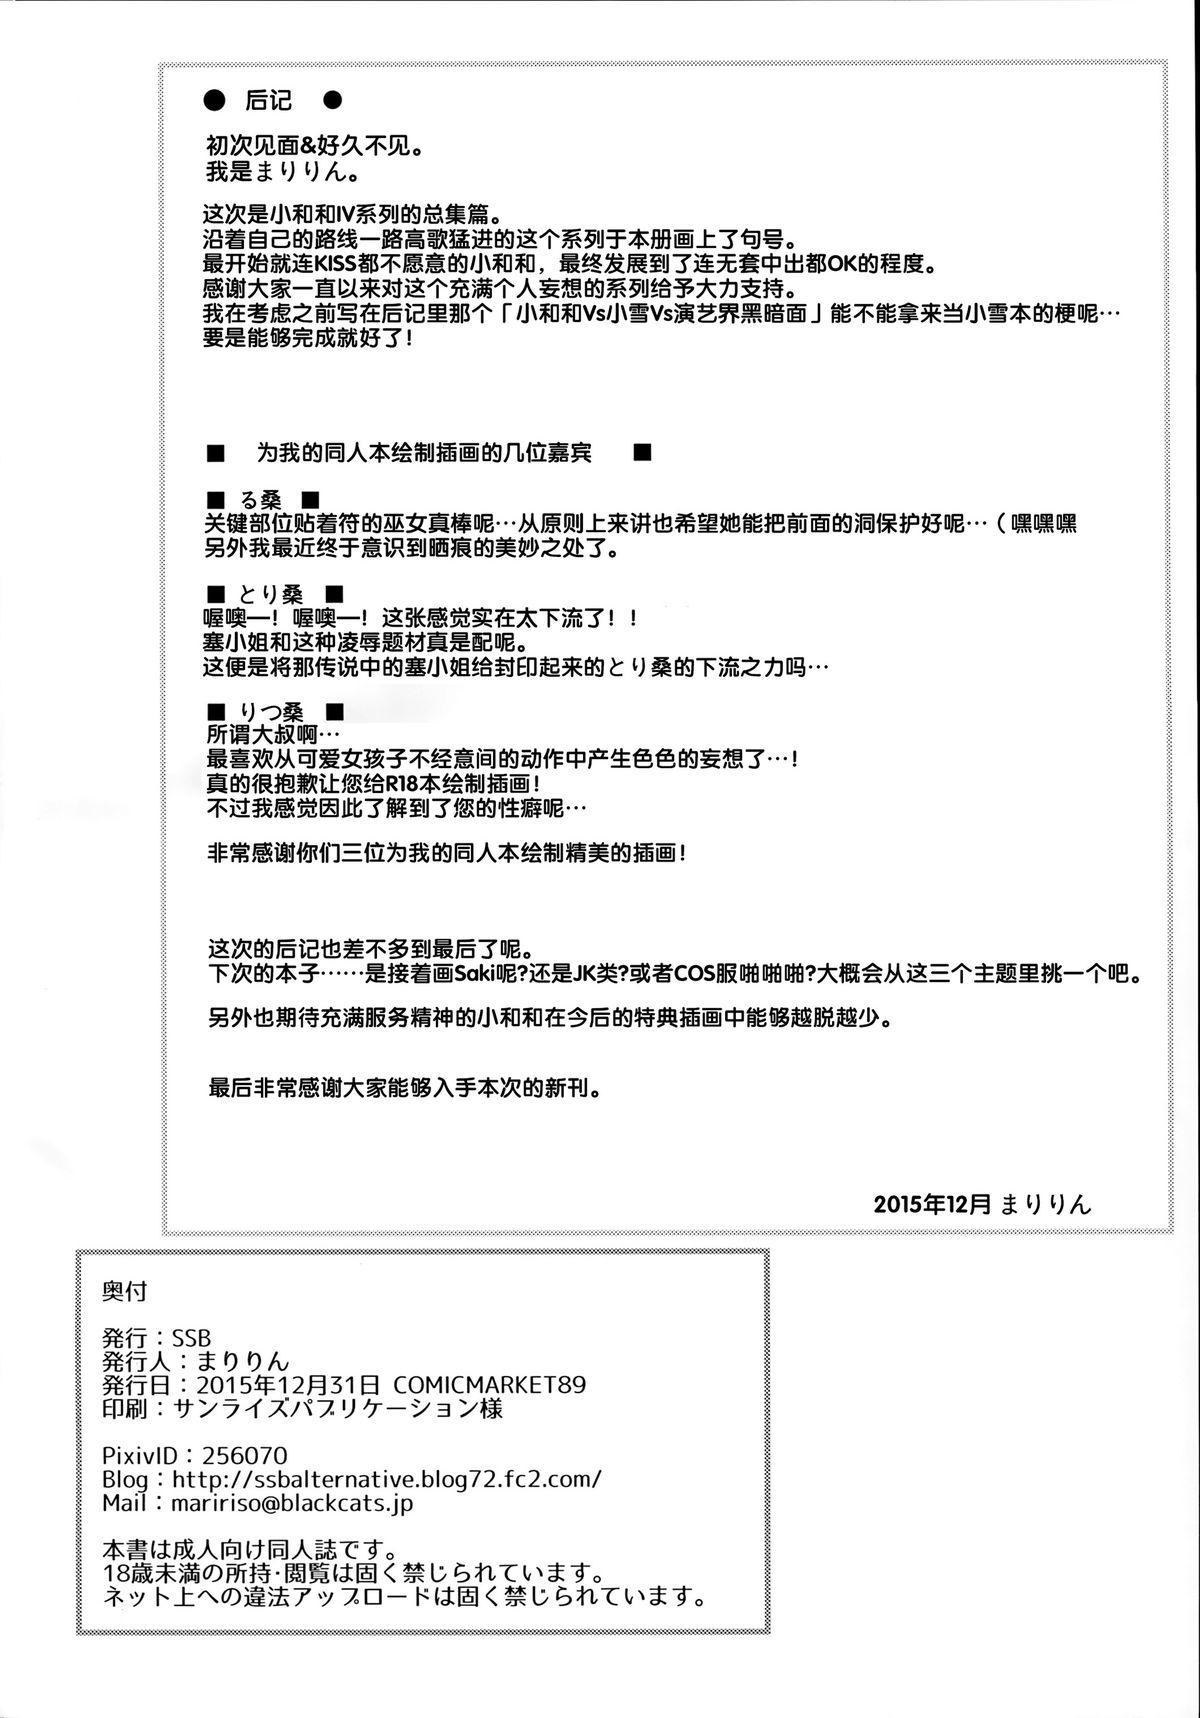 Mahjong Tenshi Nodocchi Kanzen Kaikin 120